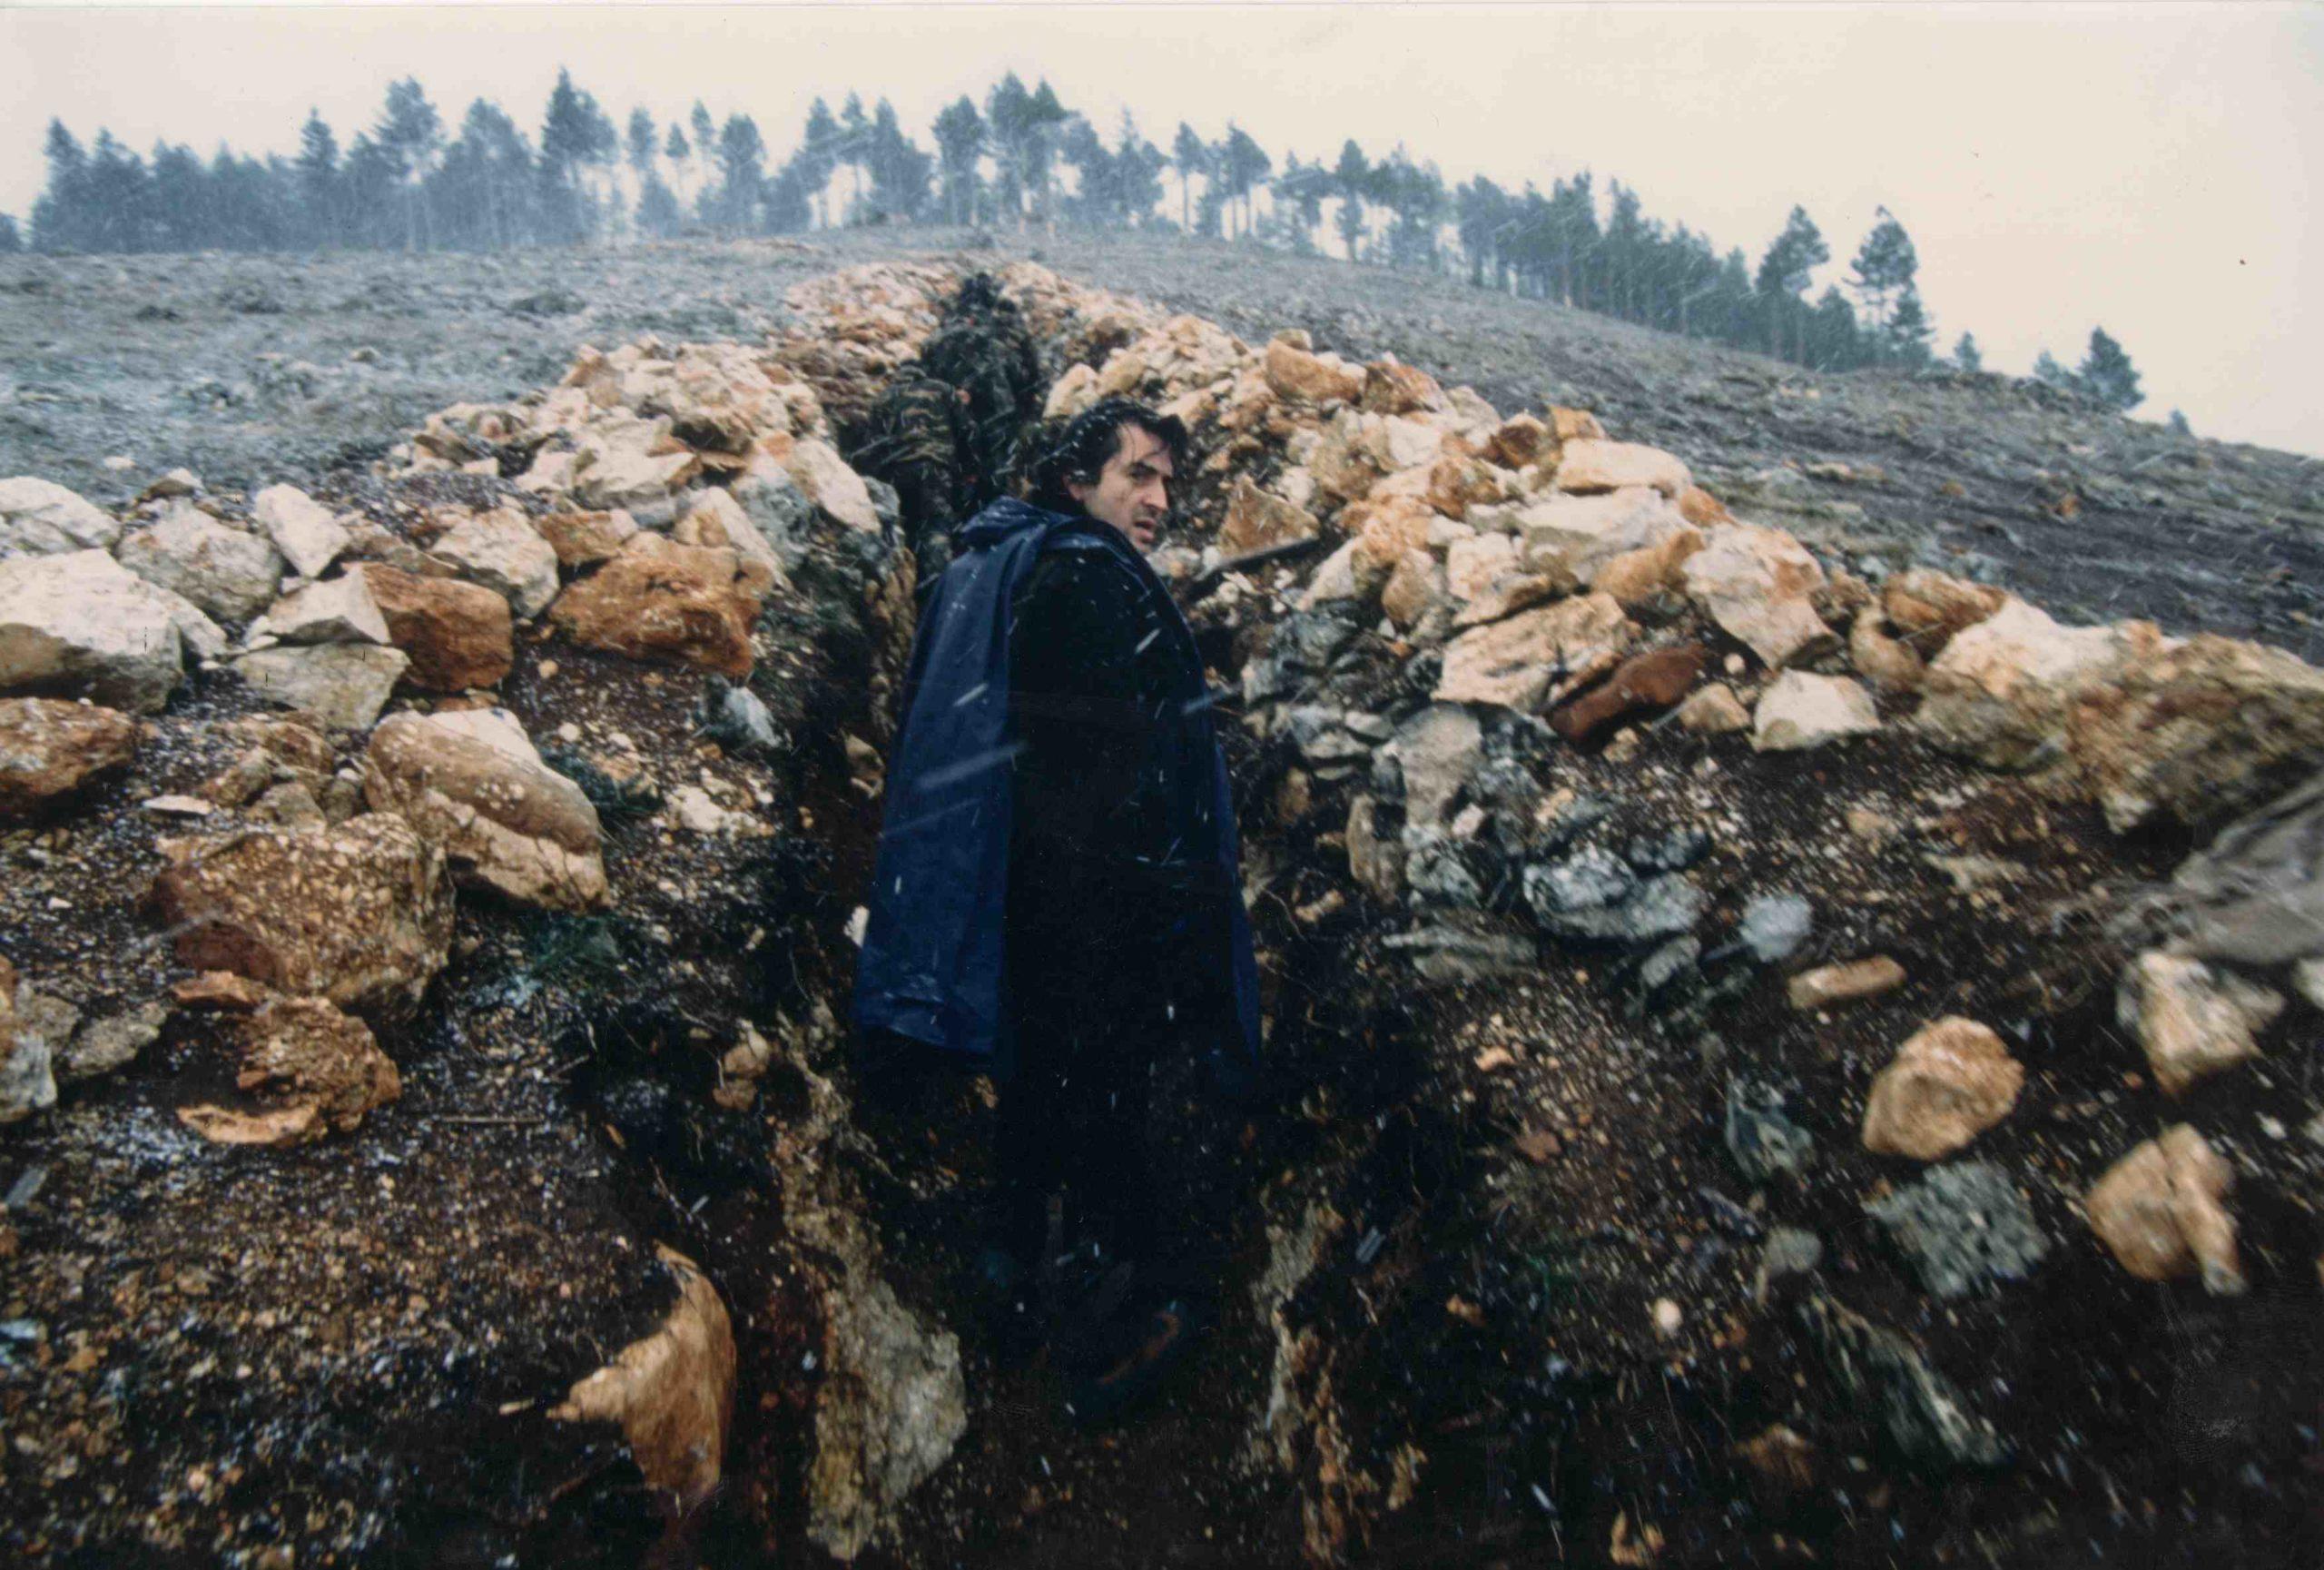 Bernard-Henri Lévy in the trenches of Sarajevo, 1993